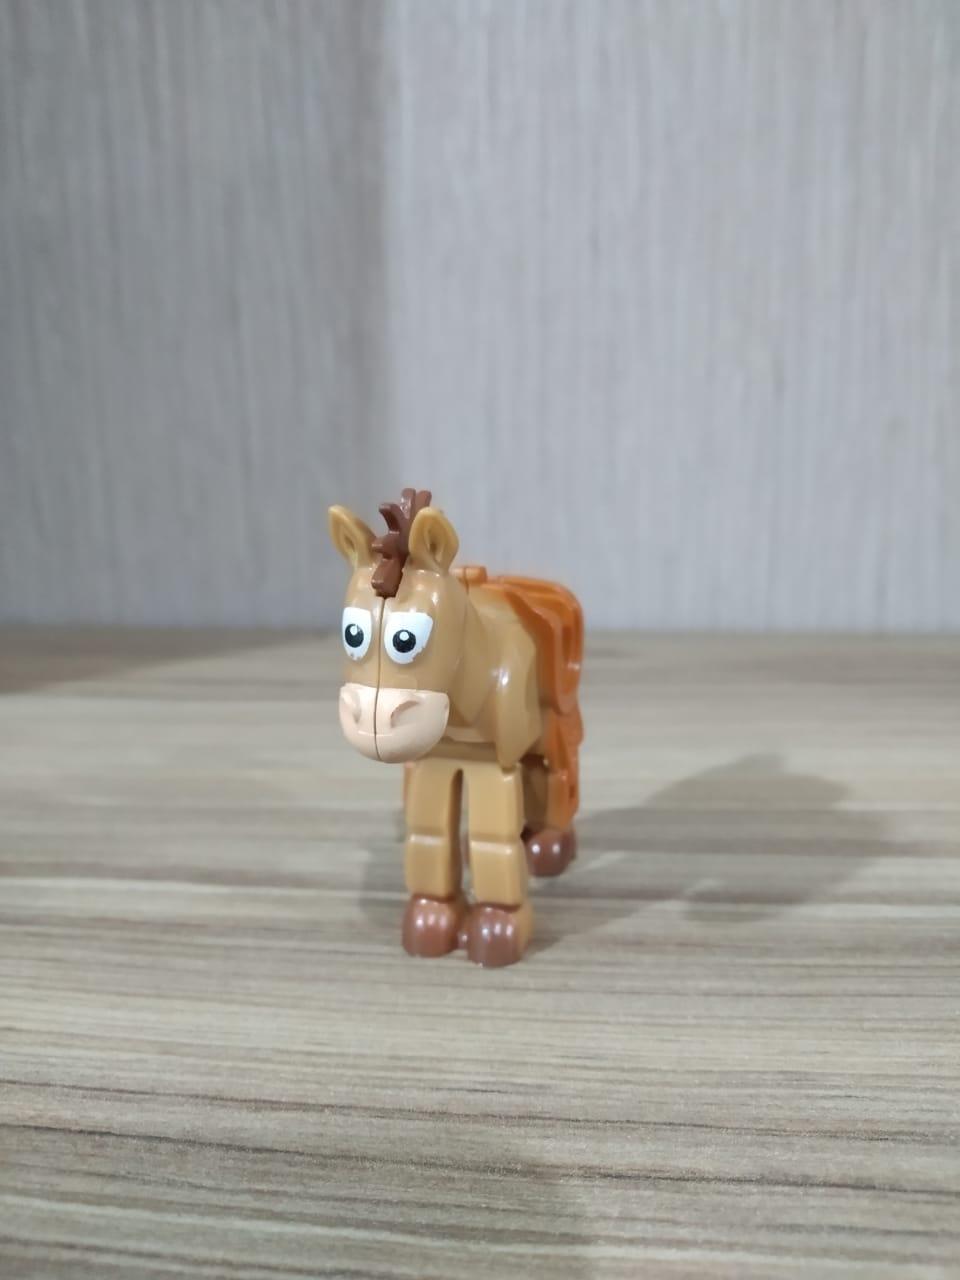 LEGO: Bala No Alvo - Toy Story